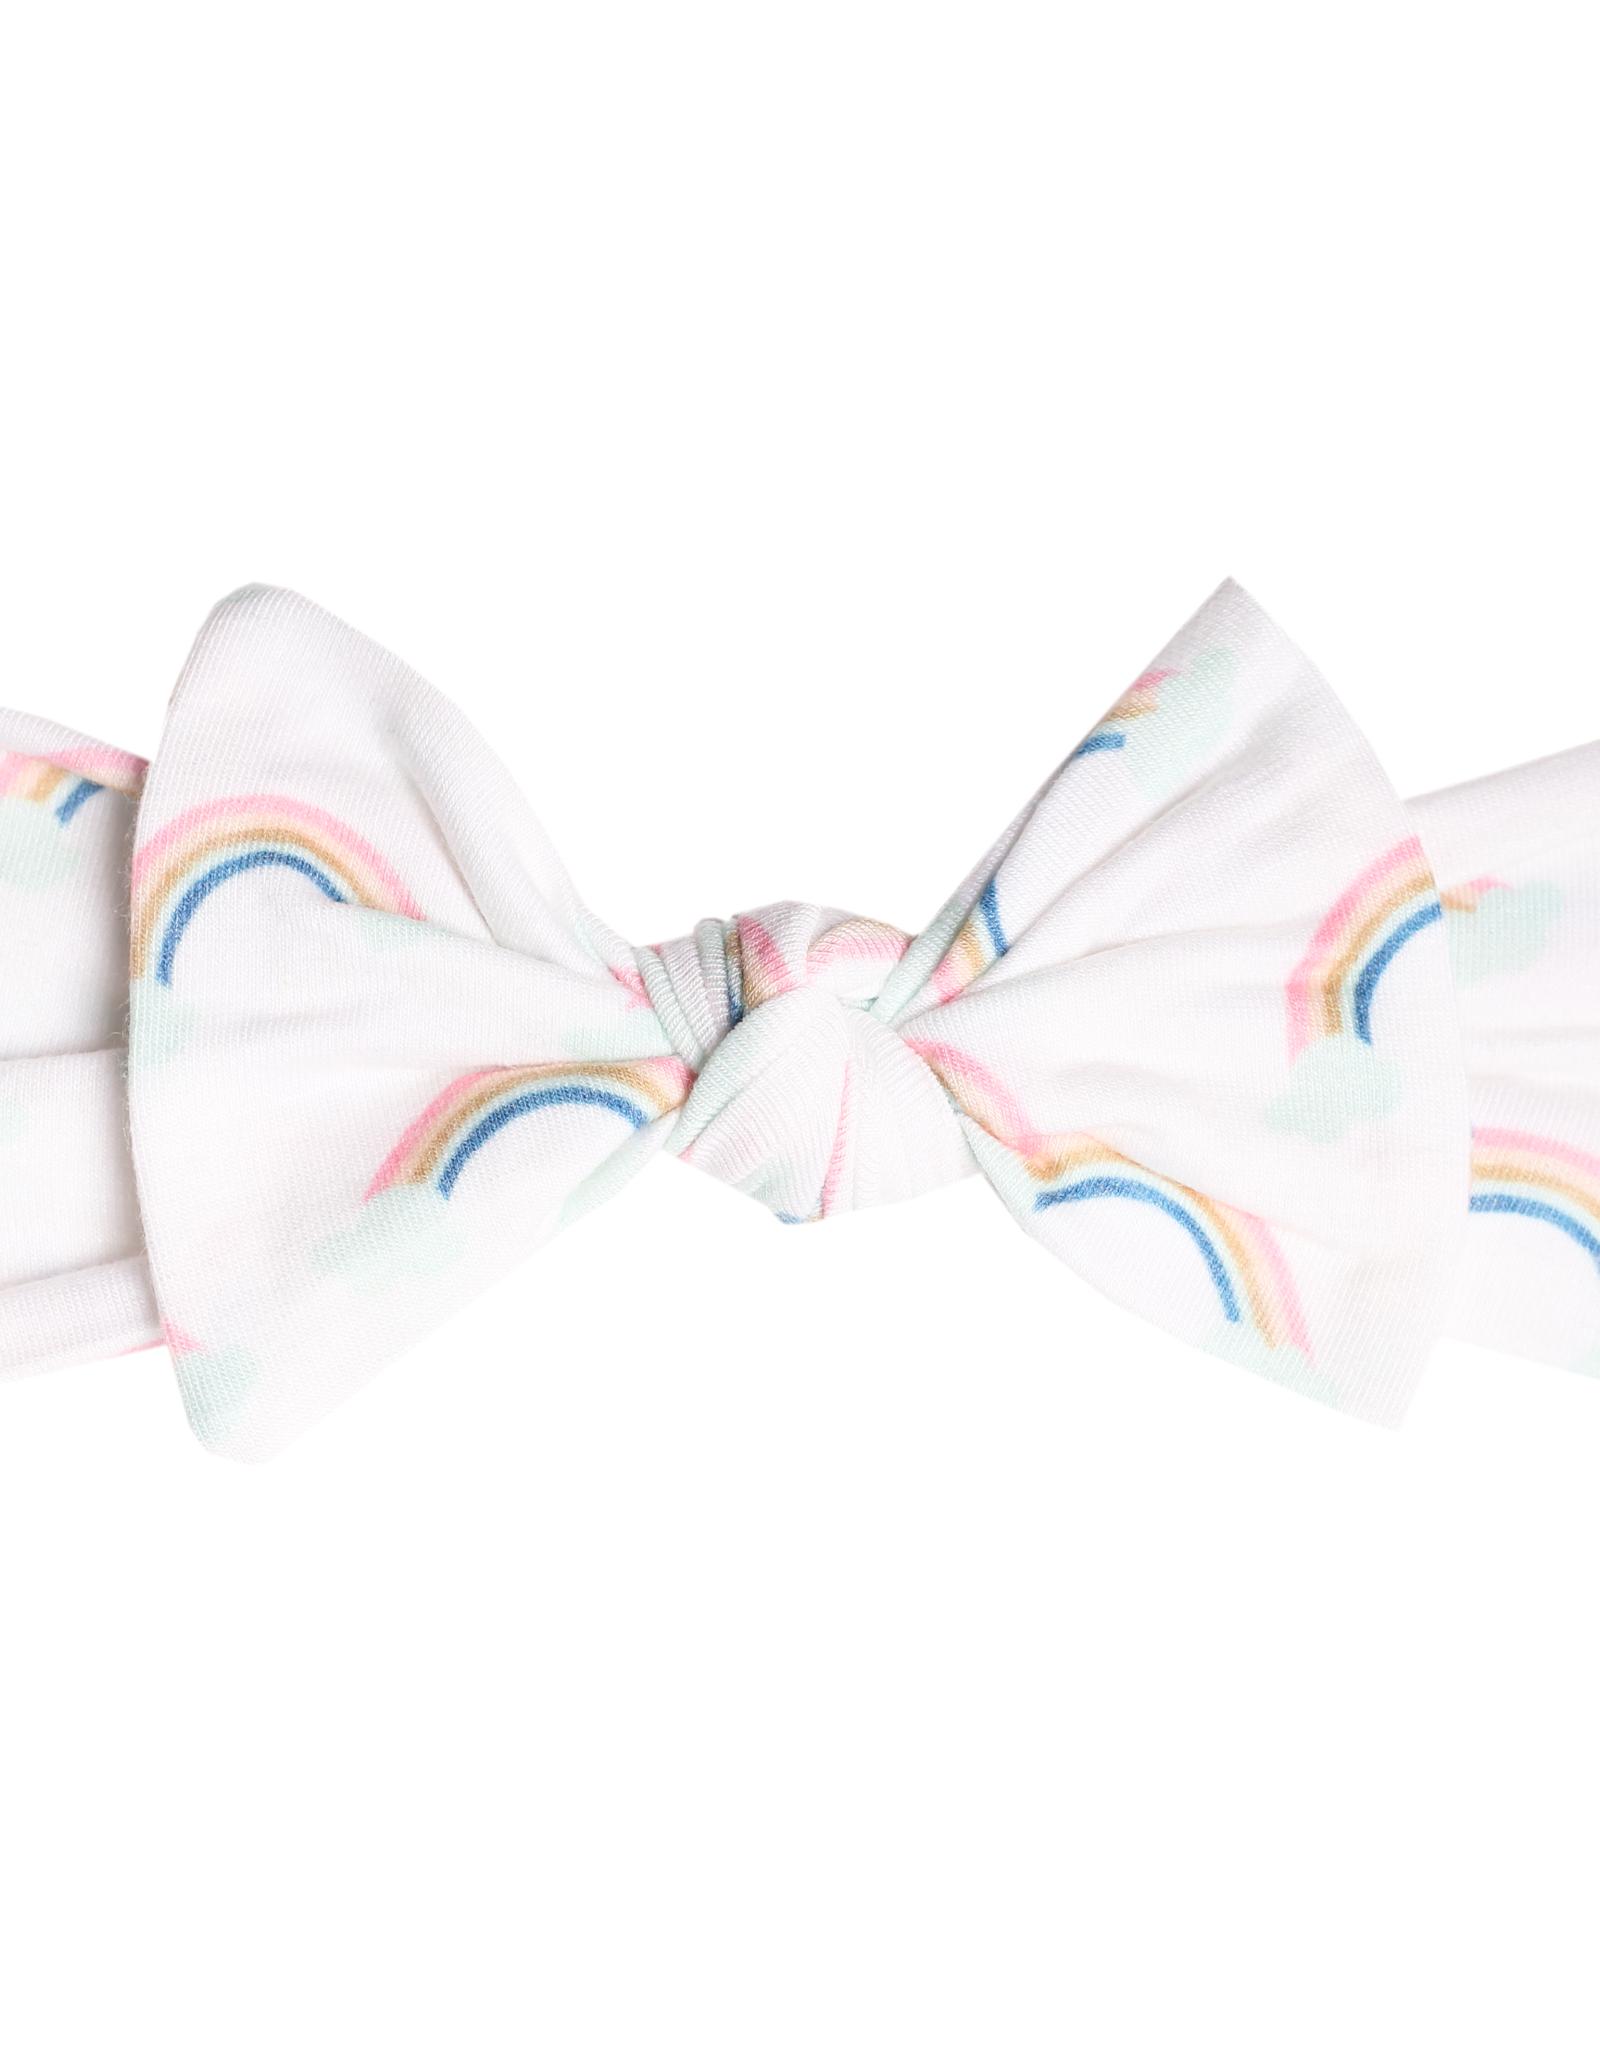 Copper Pearl Knit Headband Bow Daydream